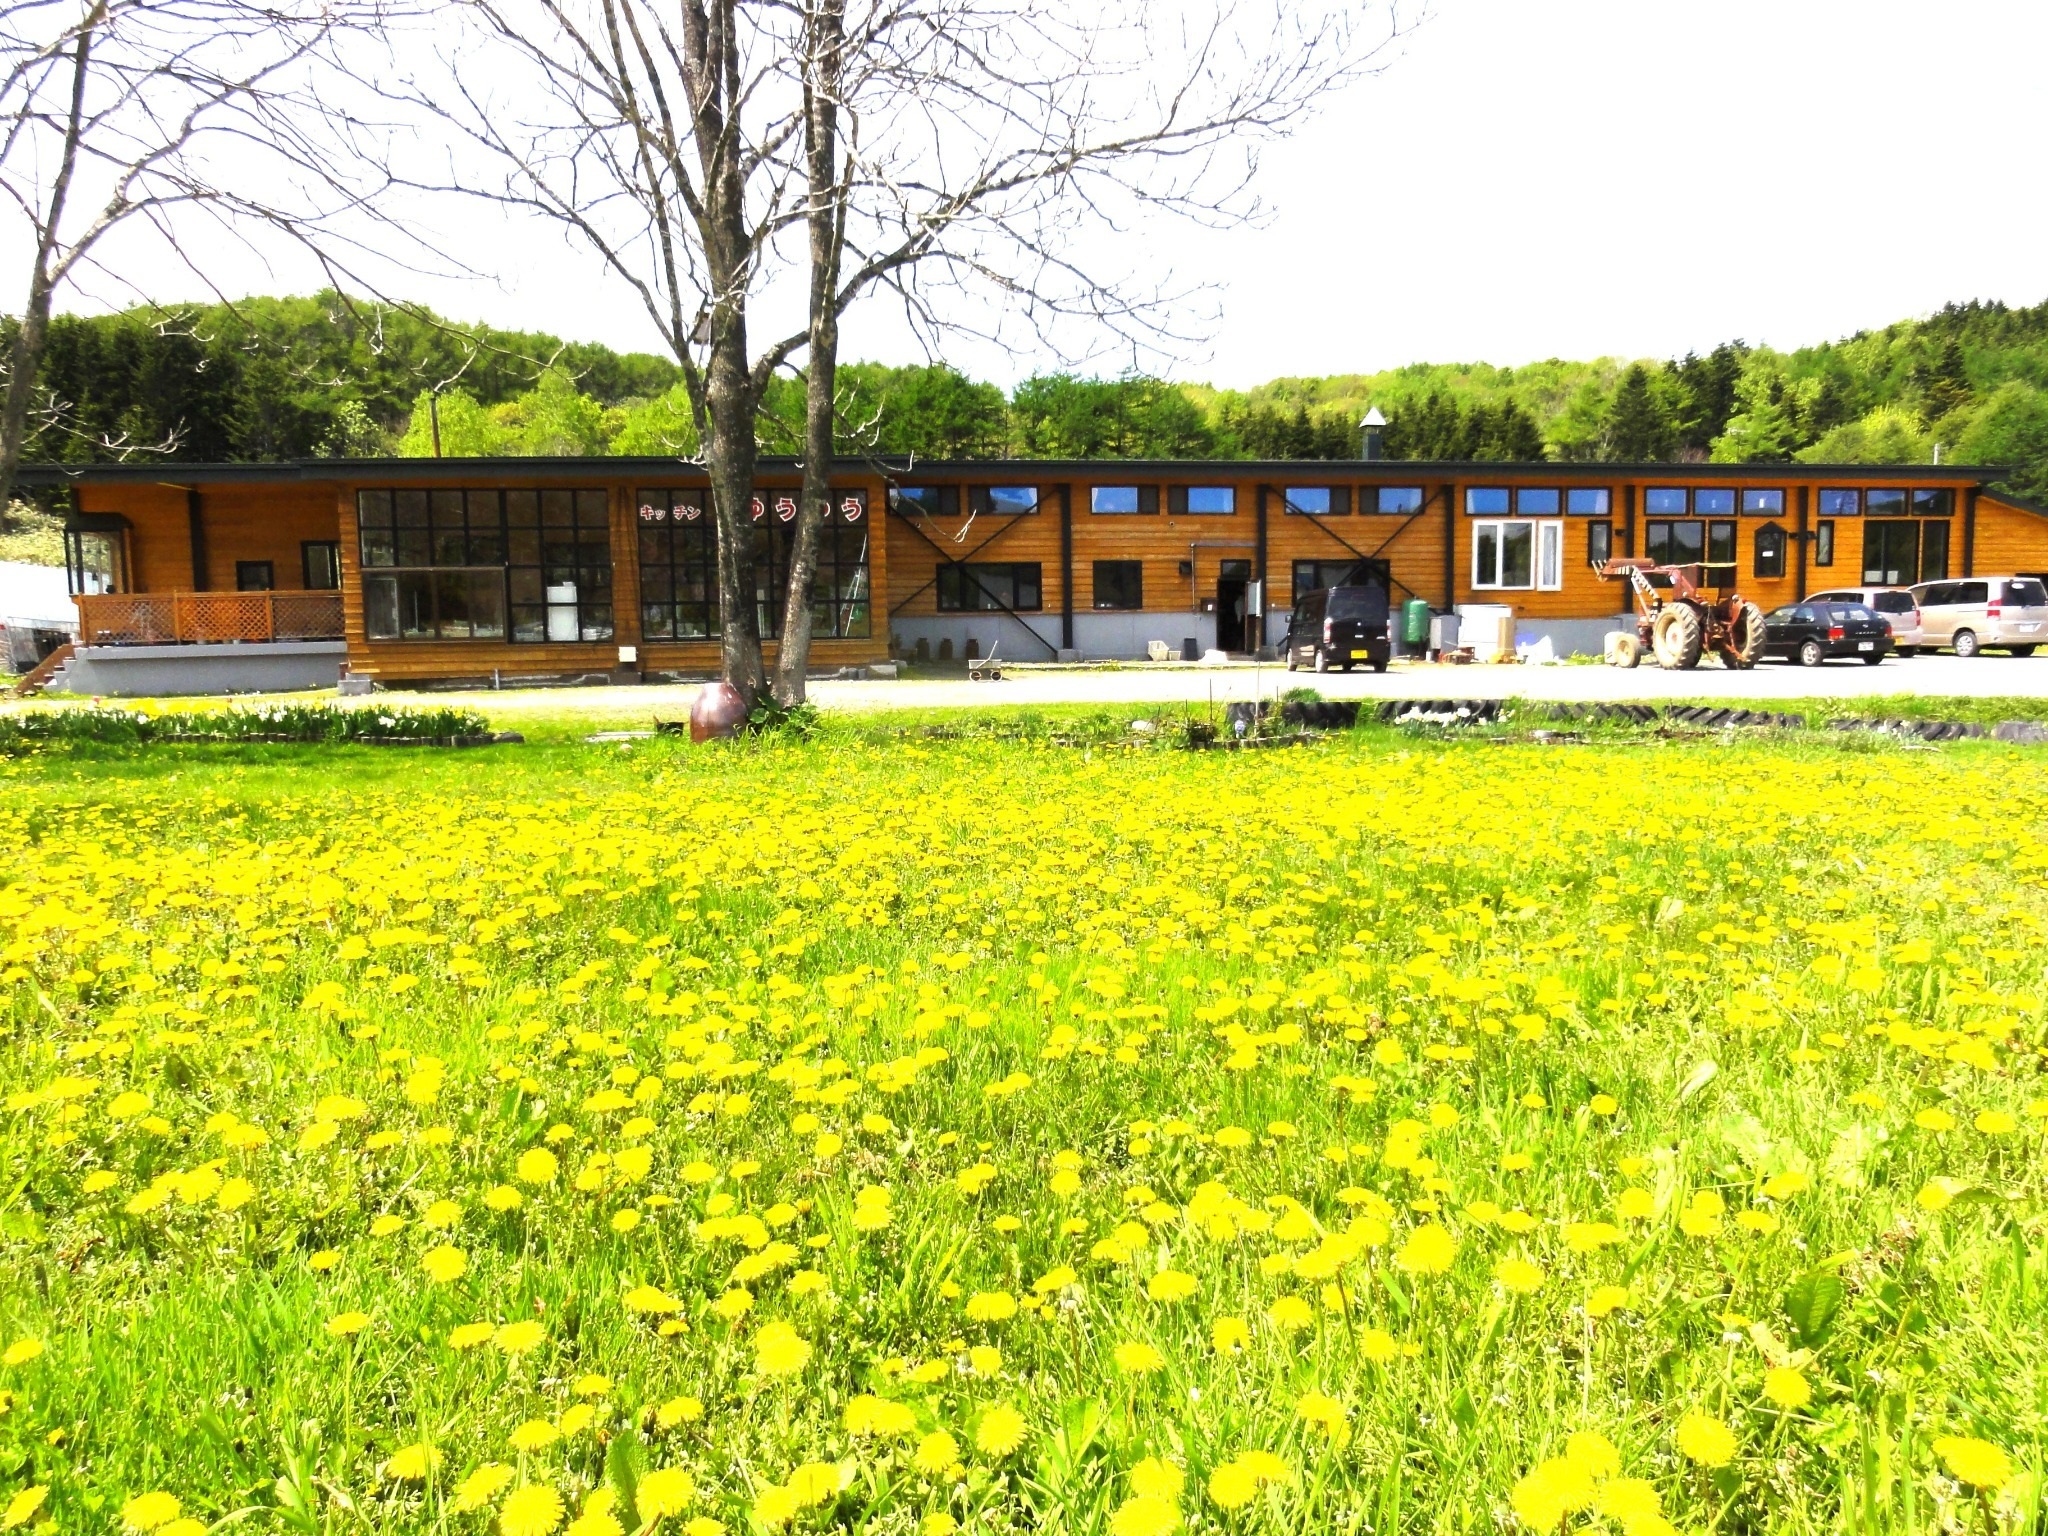 【Main House】Free Wi-Fi☆ Free Parking/ Front desk, Guest house, Laundry, GOEMON-BURO, Farm restaurant, Shops, Lounge.